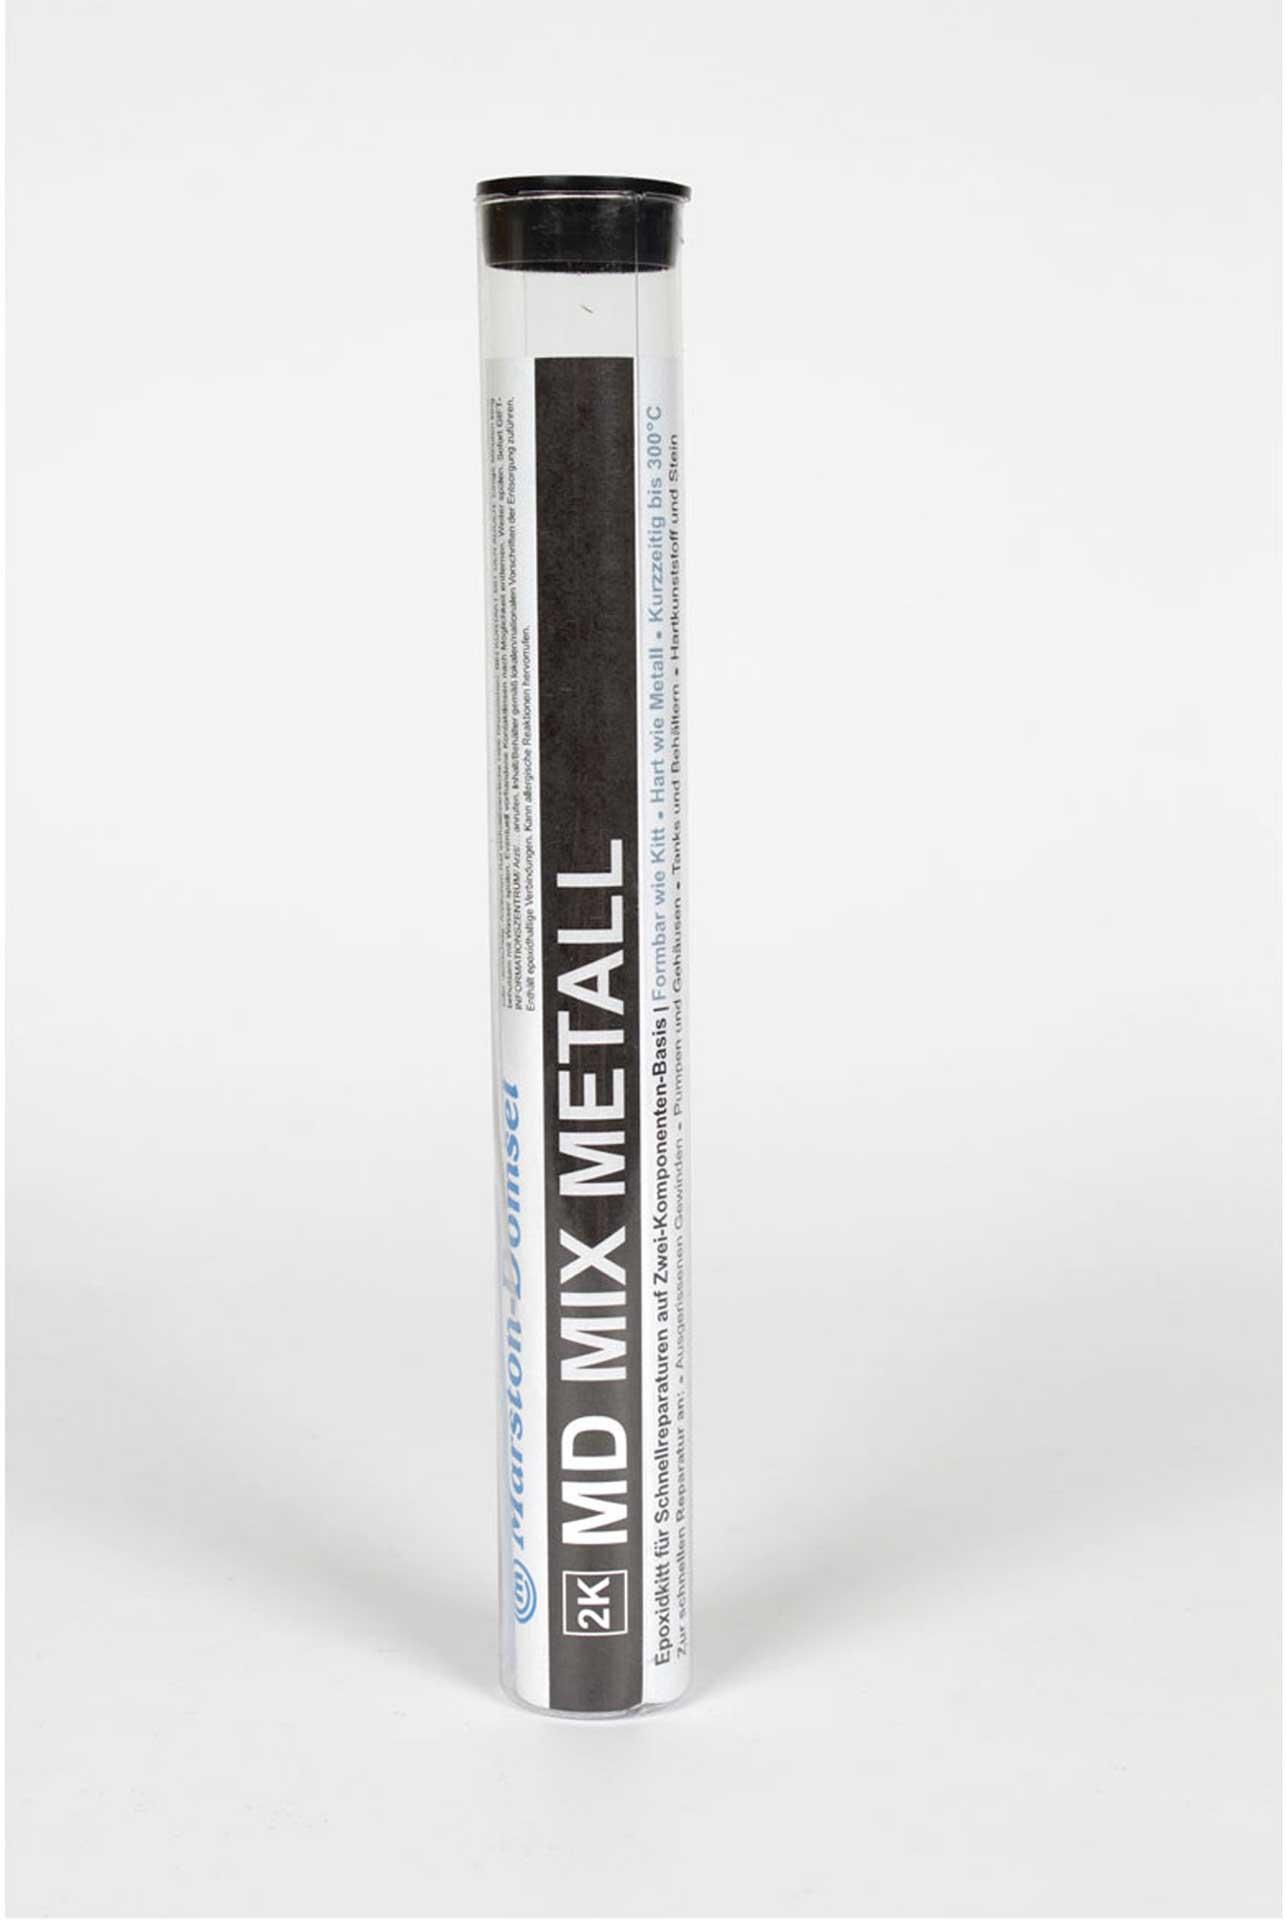 MARSTON-DOMSEL MD-mix Reparaturkitt Stahl/Metall 56g